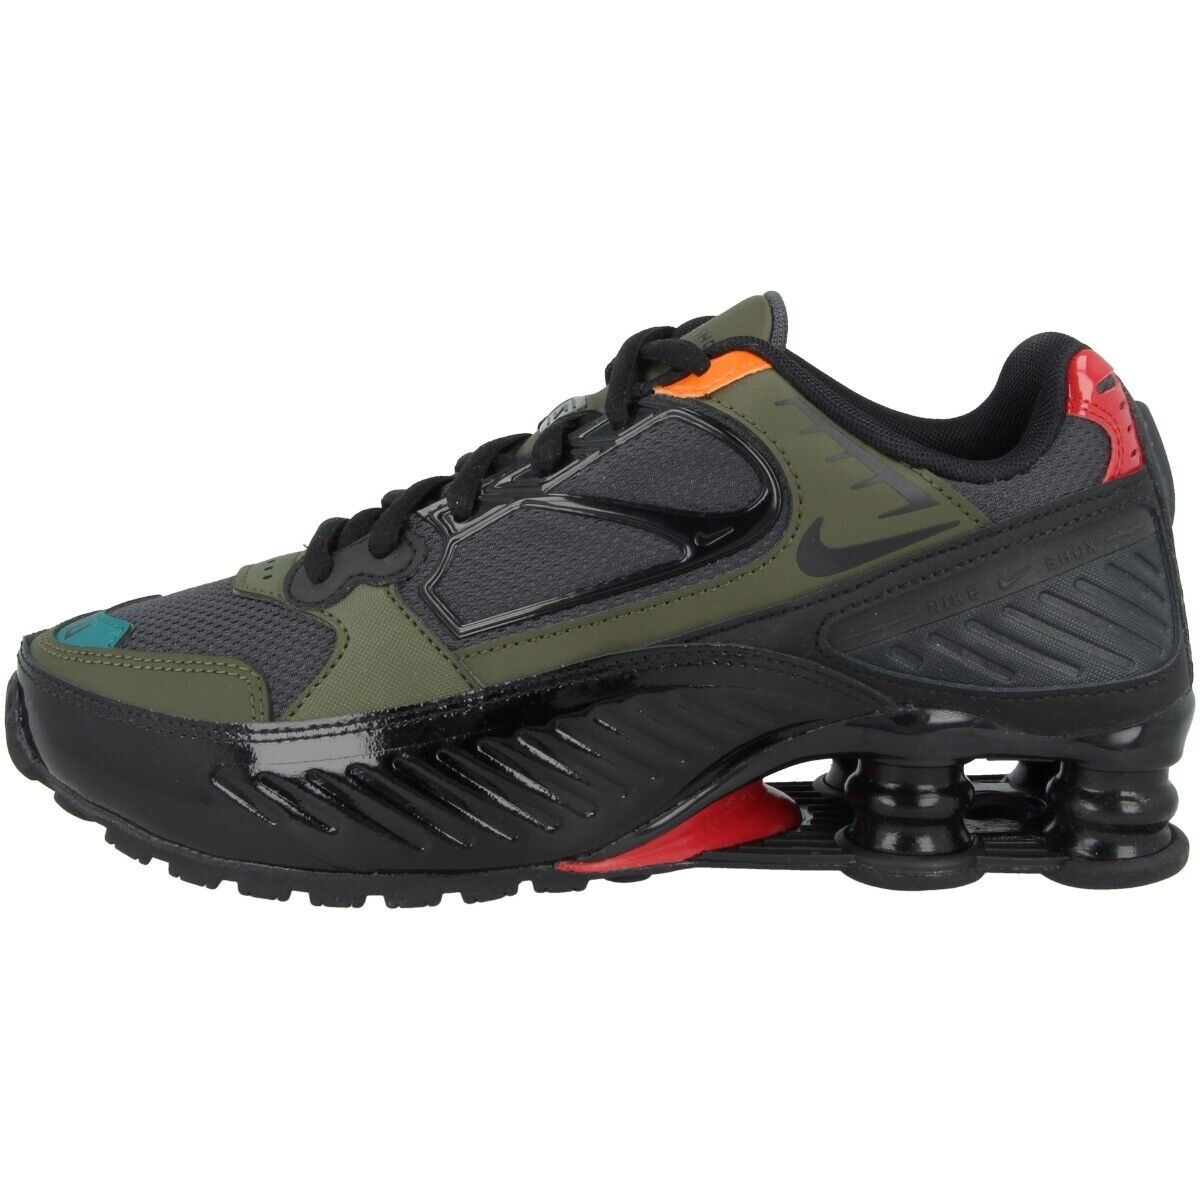 1 Paar Nike Schuhe Größe 38